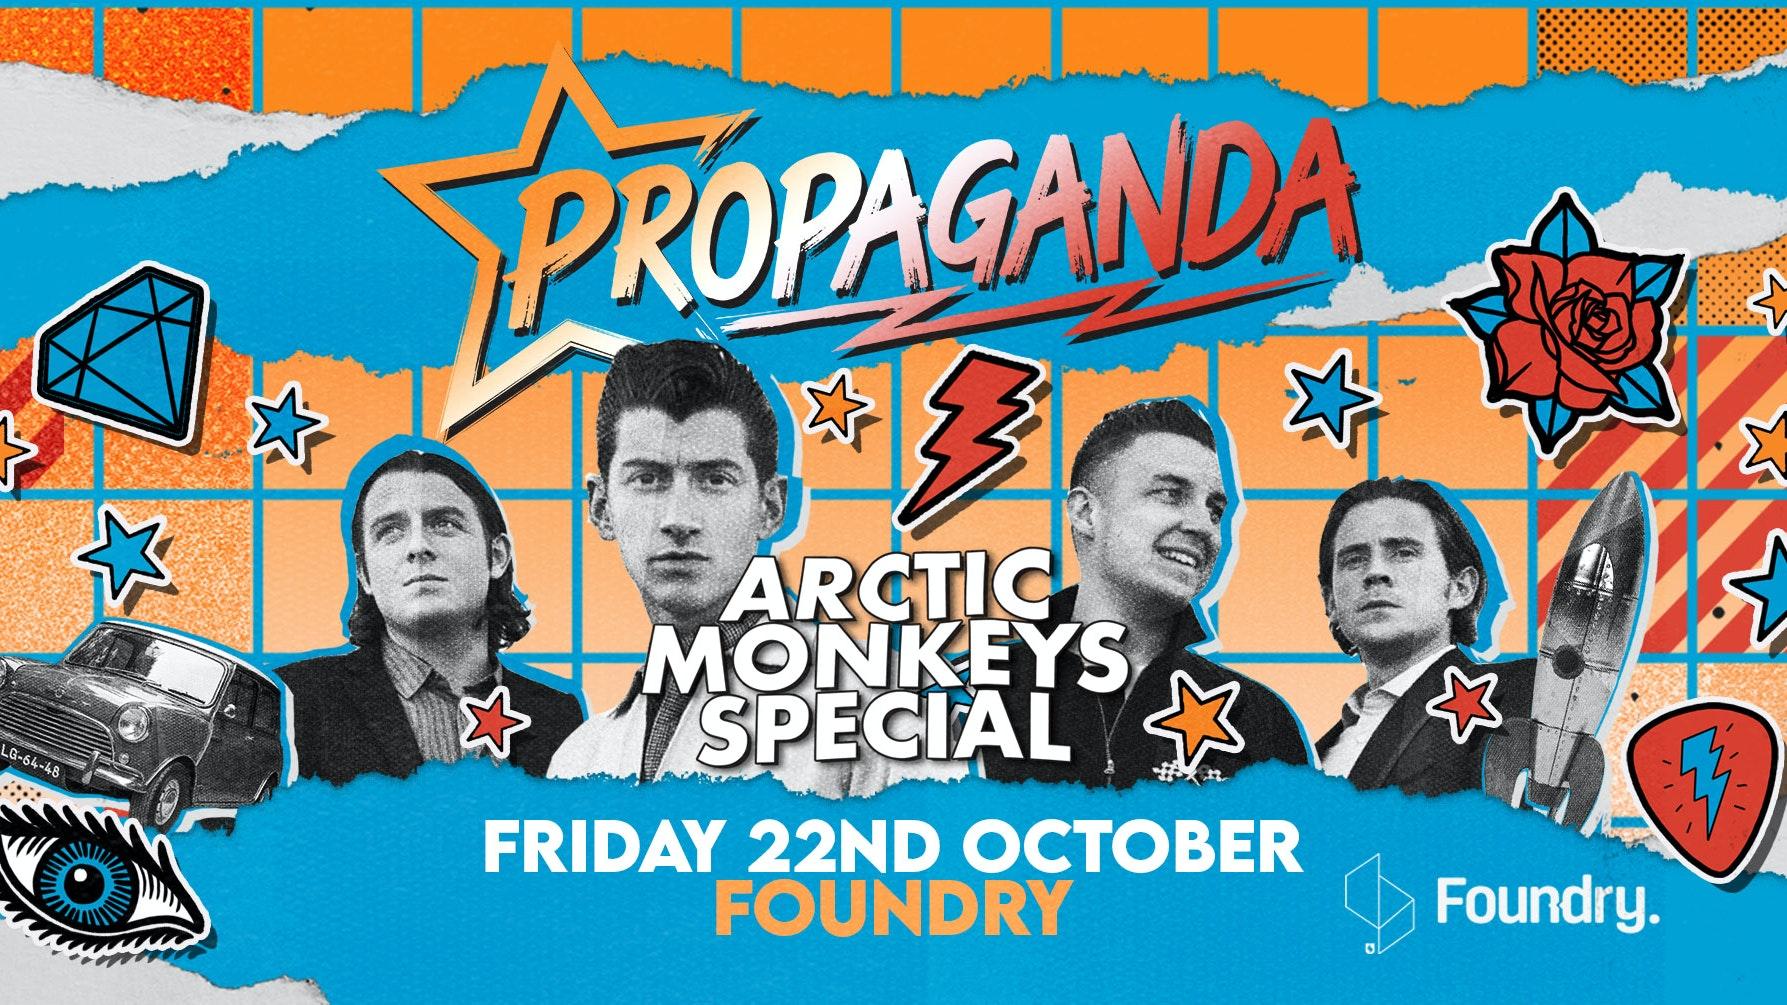 Propaganda Sheffield – Arctic Monkeys Special!